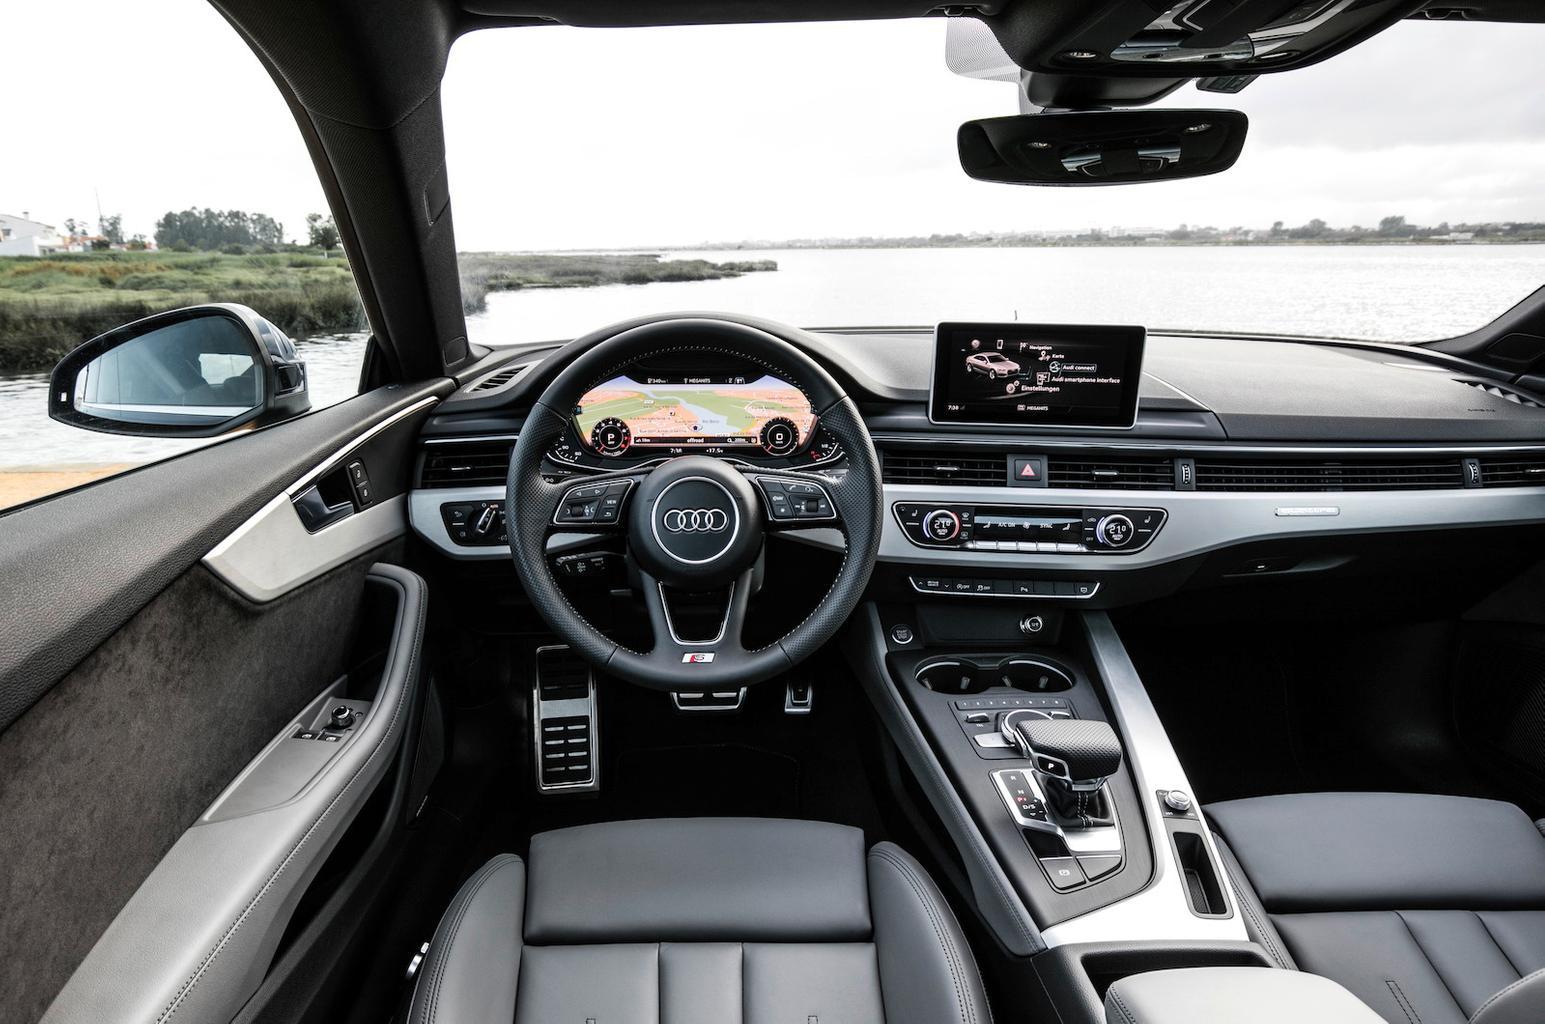 2016 Audi A5 3.0 TDI 286 review